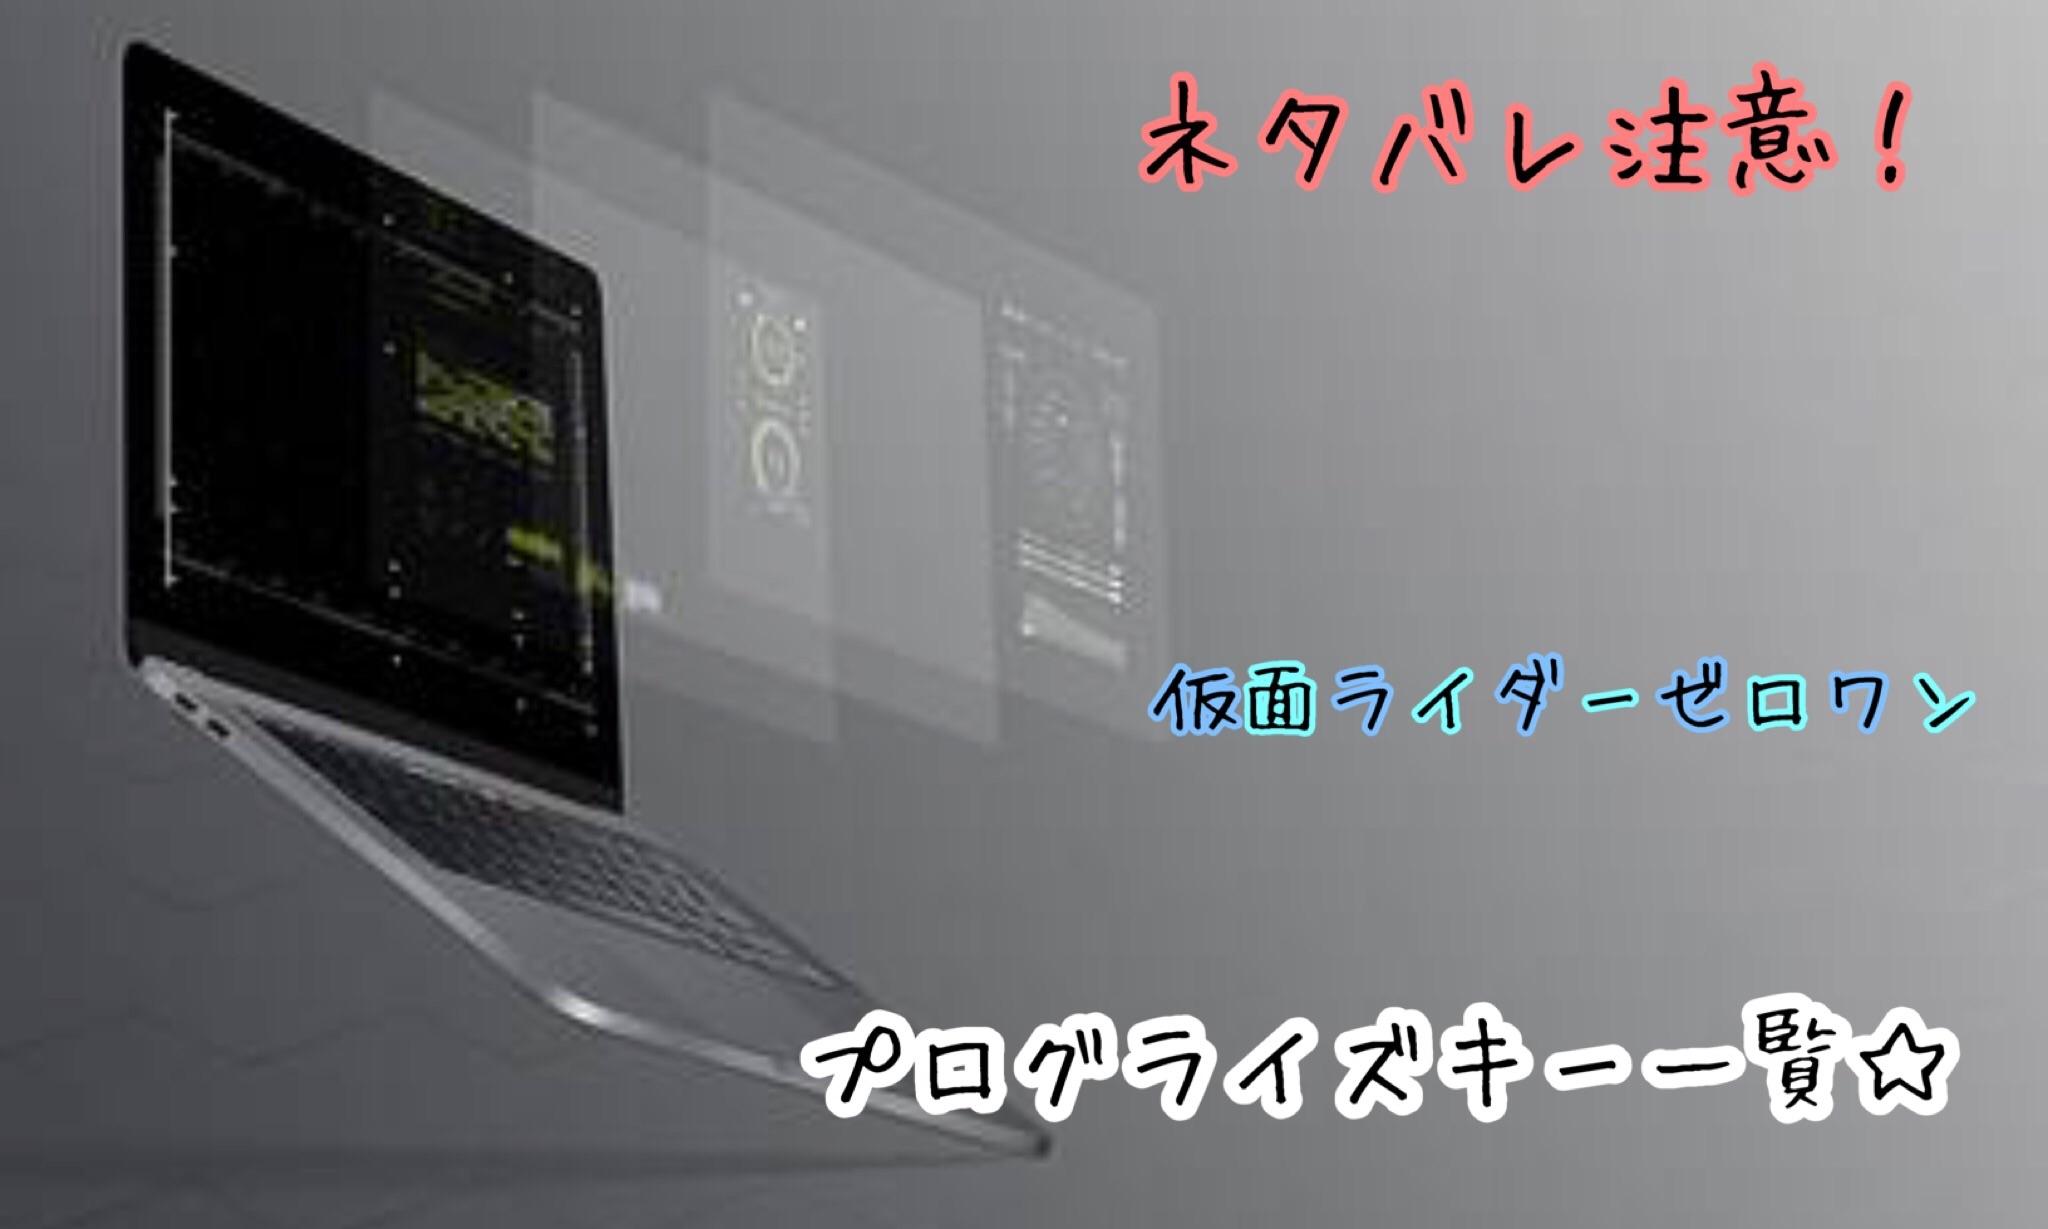 f:id:kanaemama:20190915090451j:image